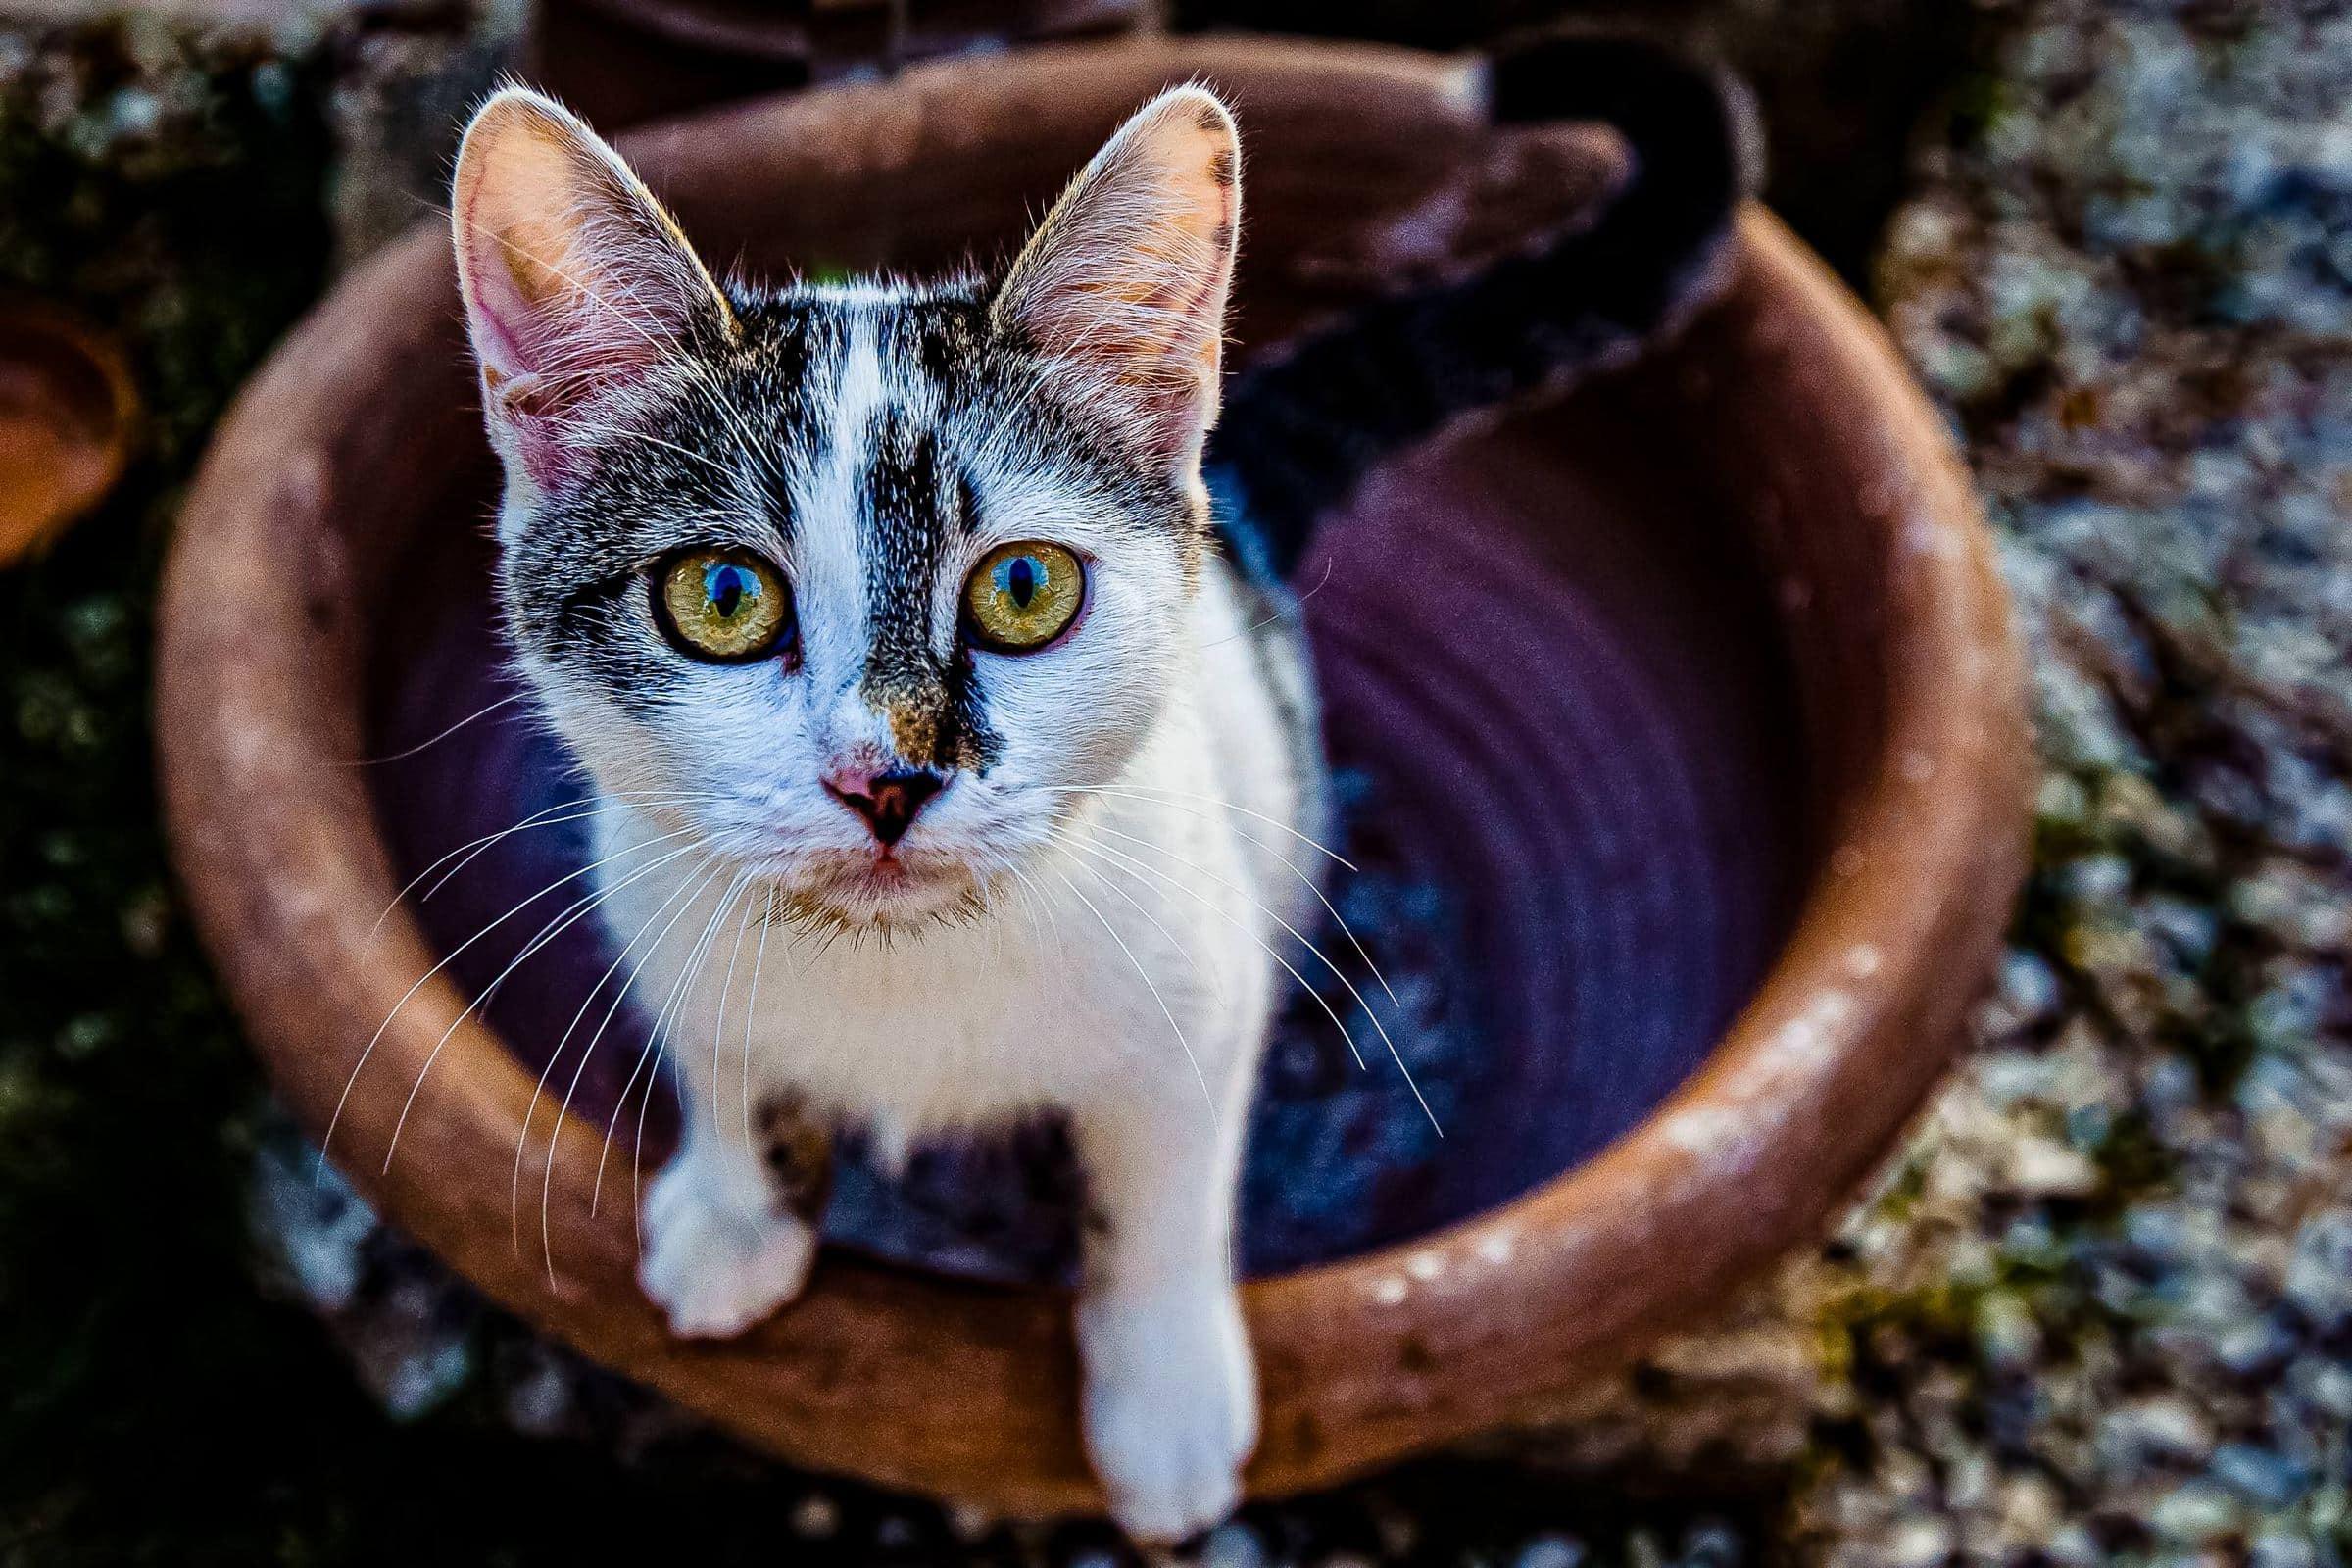 Beautiful kitten eyes at a Villa Tre Grazie wedding celebration near Todi, Italy.